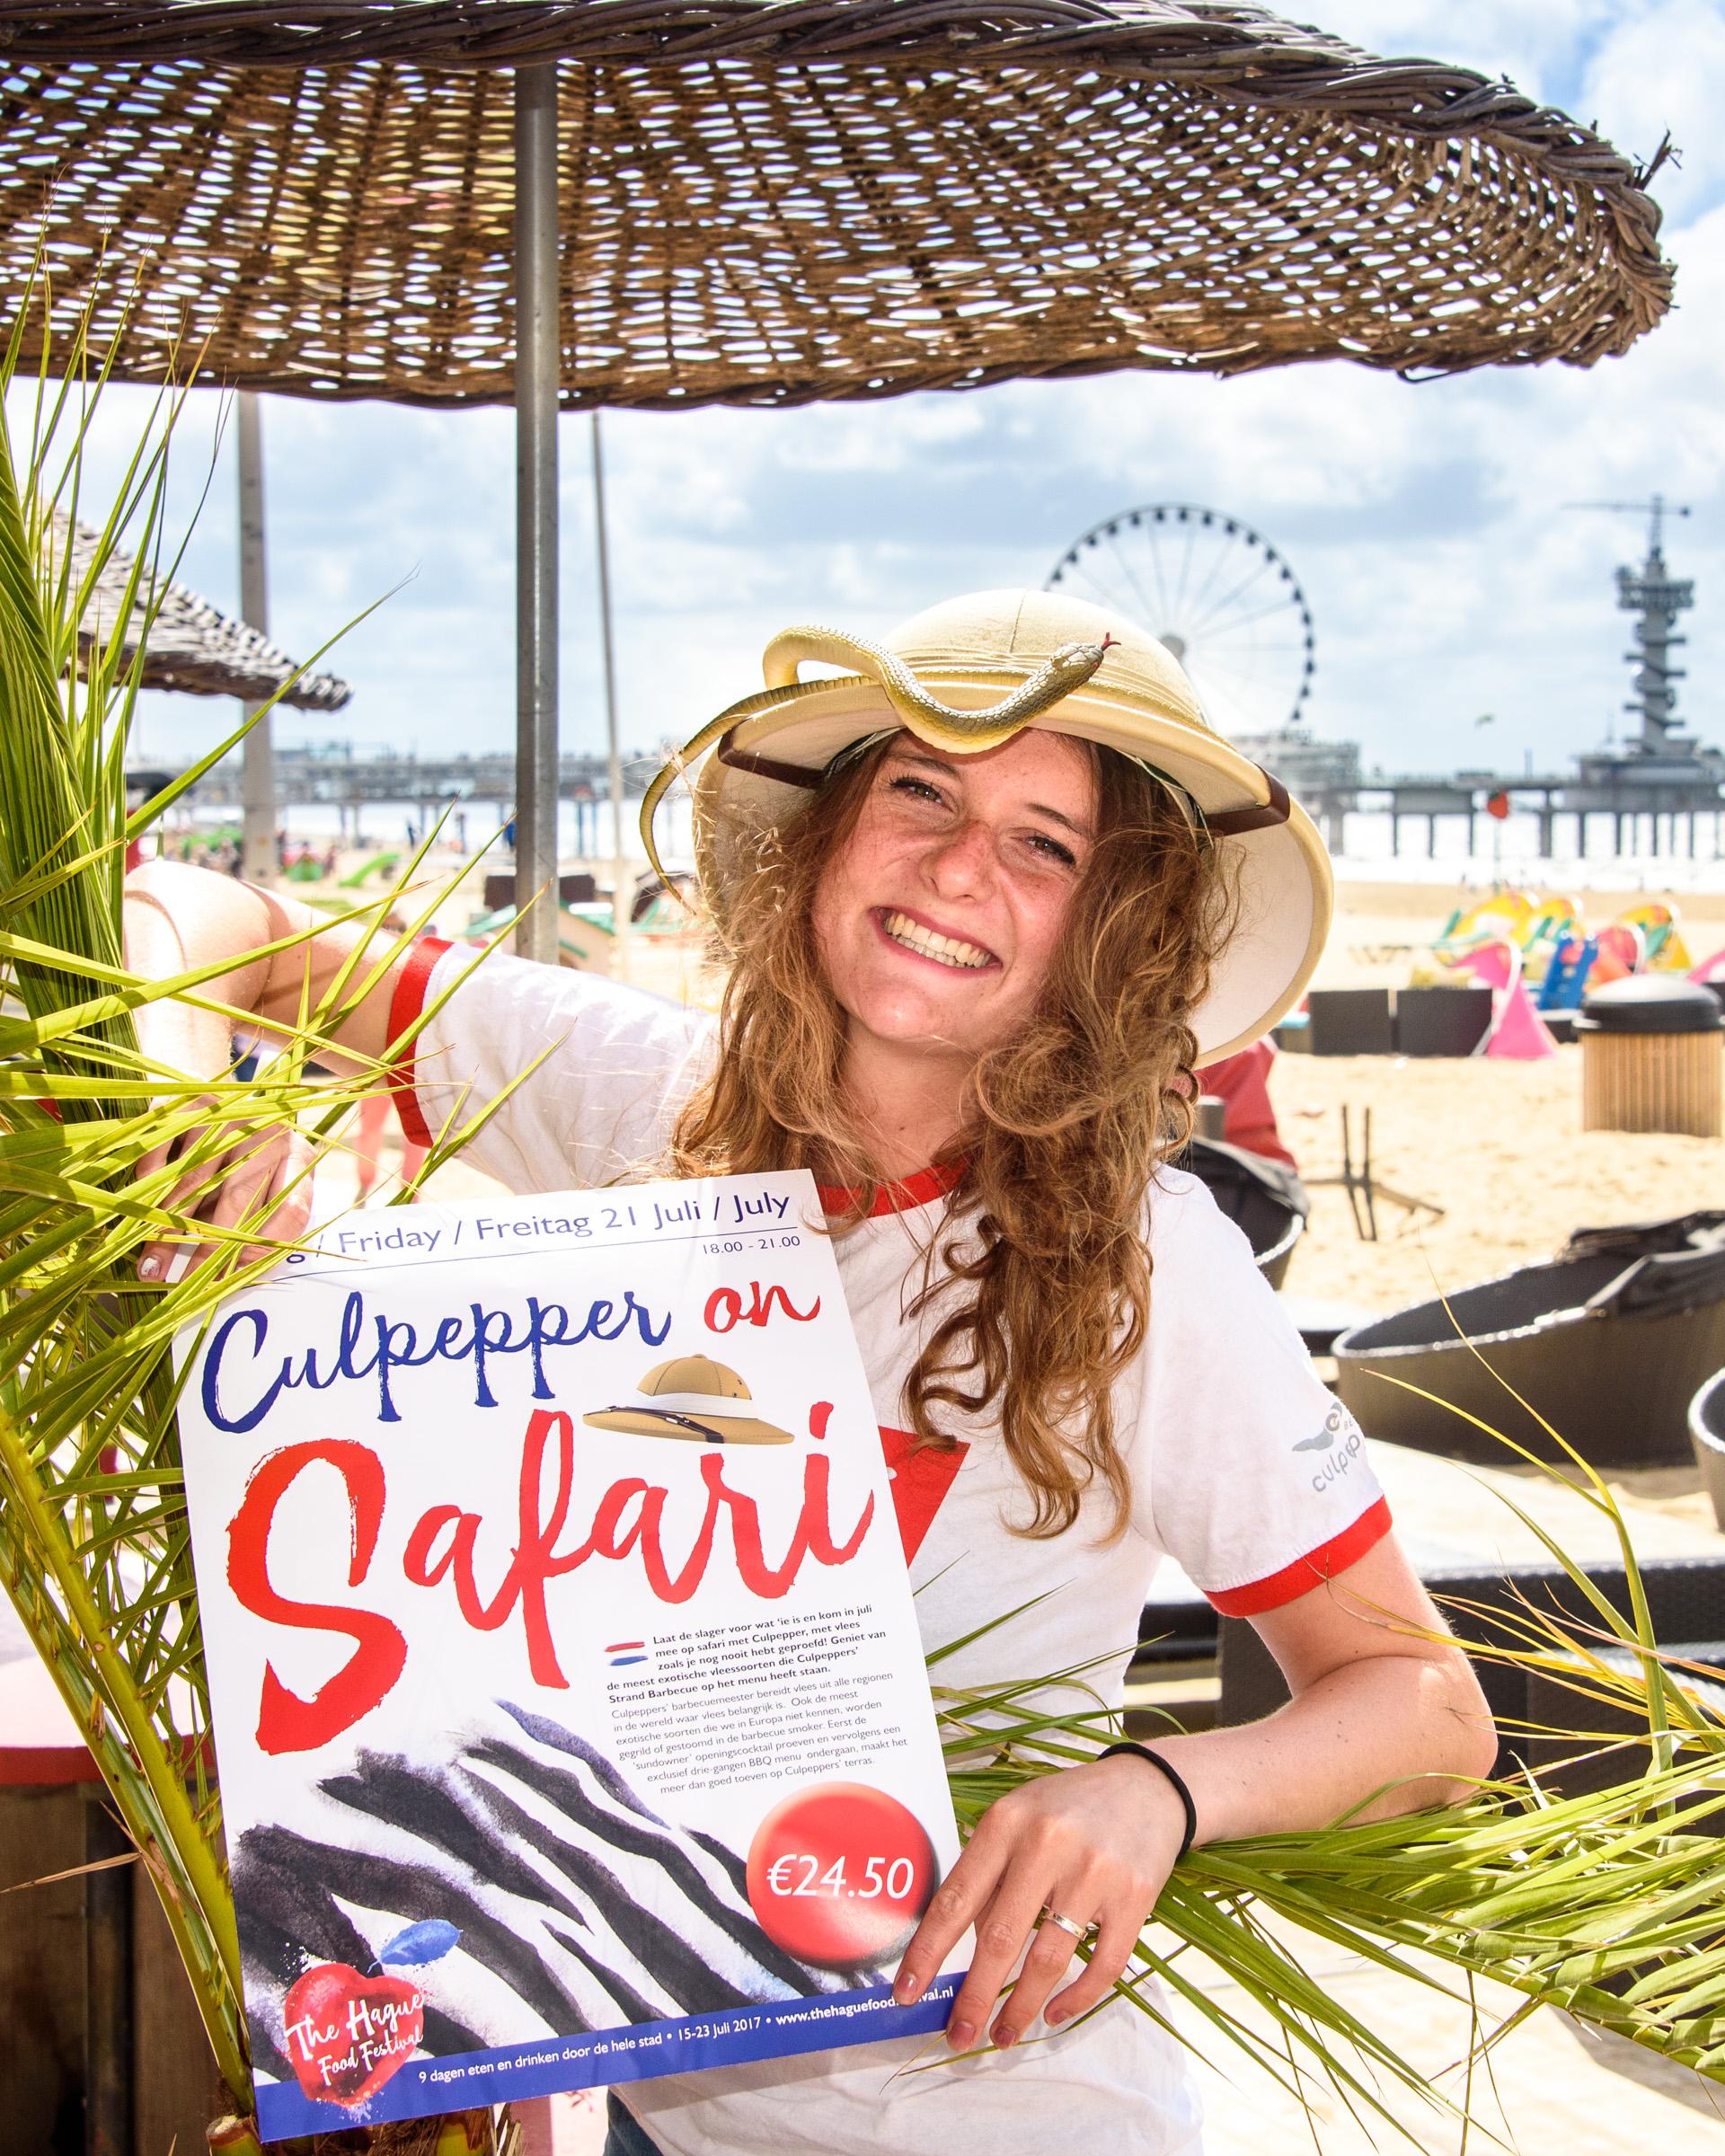 Culpepper Safari. The Hague Food Festival Businesses. ©Julia Claxton